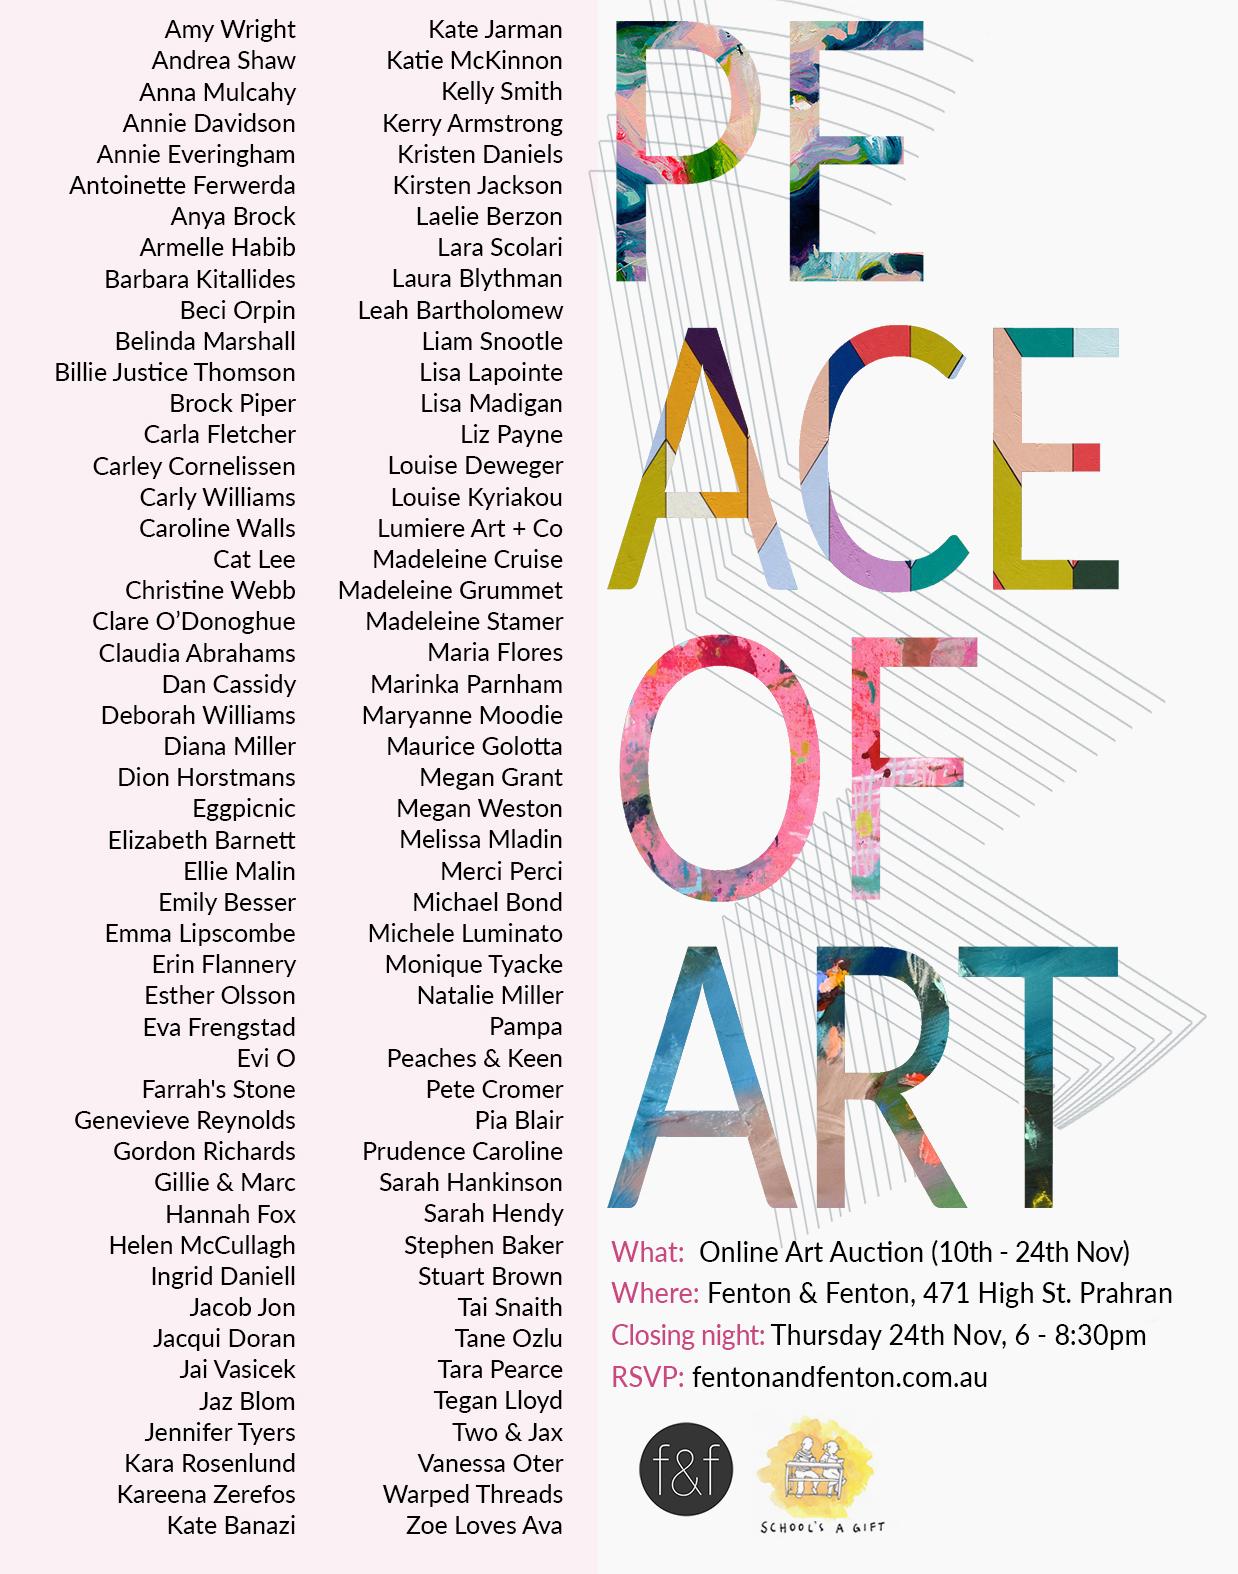 Peace of Art 2016 - Australian online art auction for charity